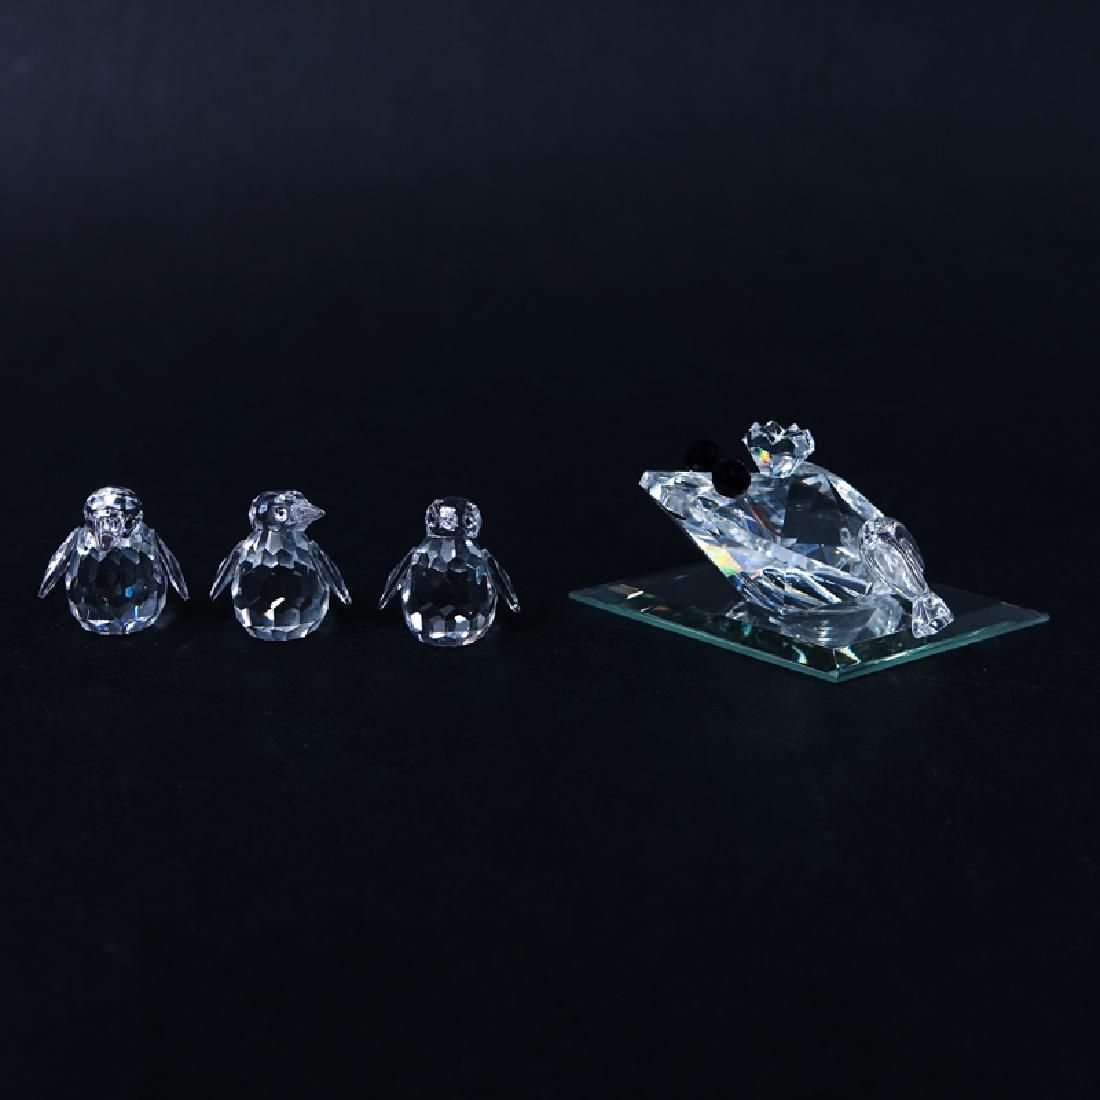 Four (4) Swarovski Crystal Animal Figurine in Original